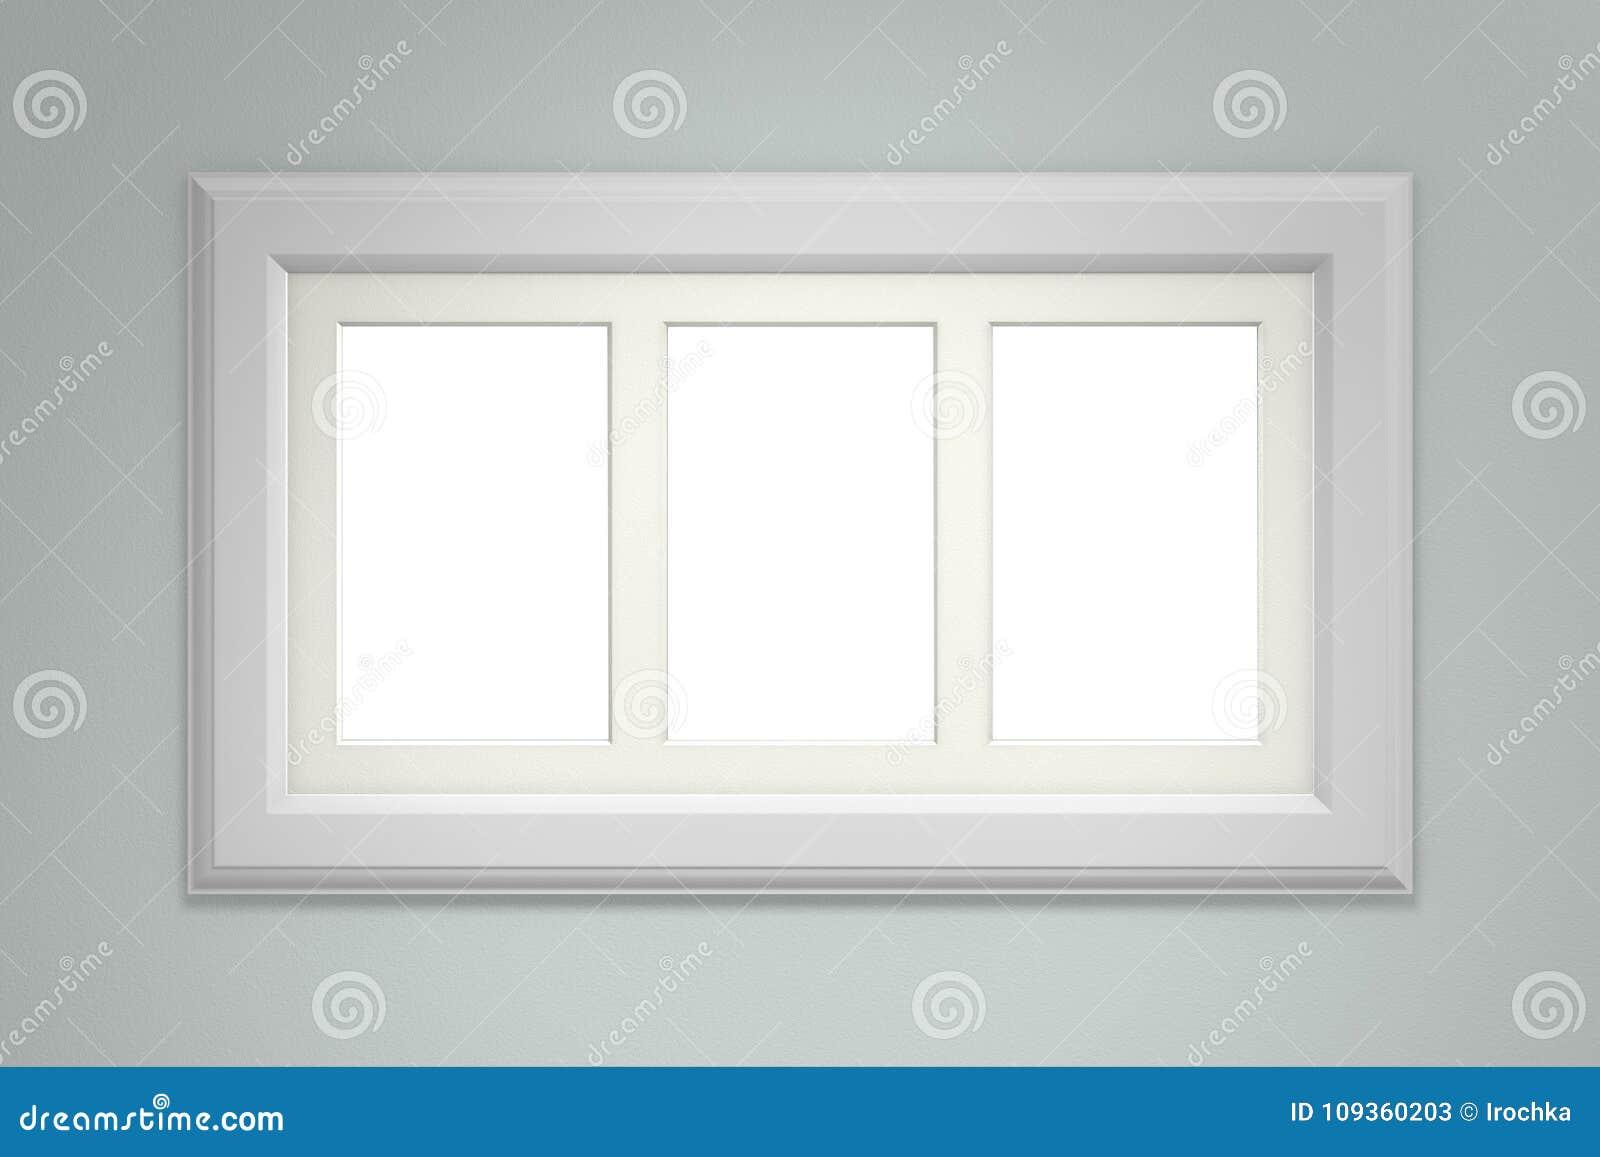 nett halterung f r bilderrahmen fotos bilderrahmen ideen. Black Bedroom Furniture Sets. Home Design Ideas